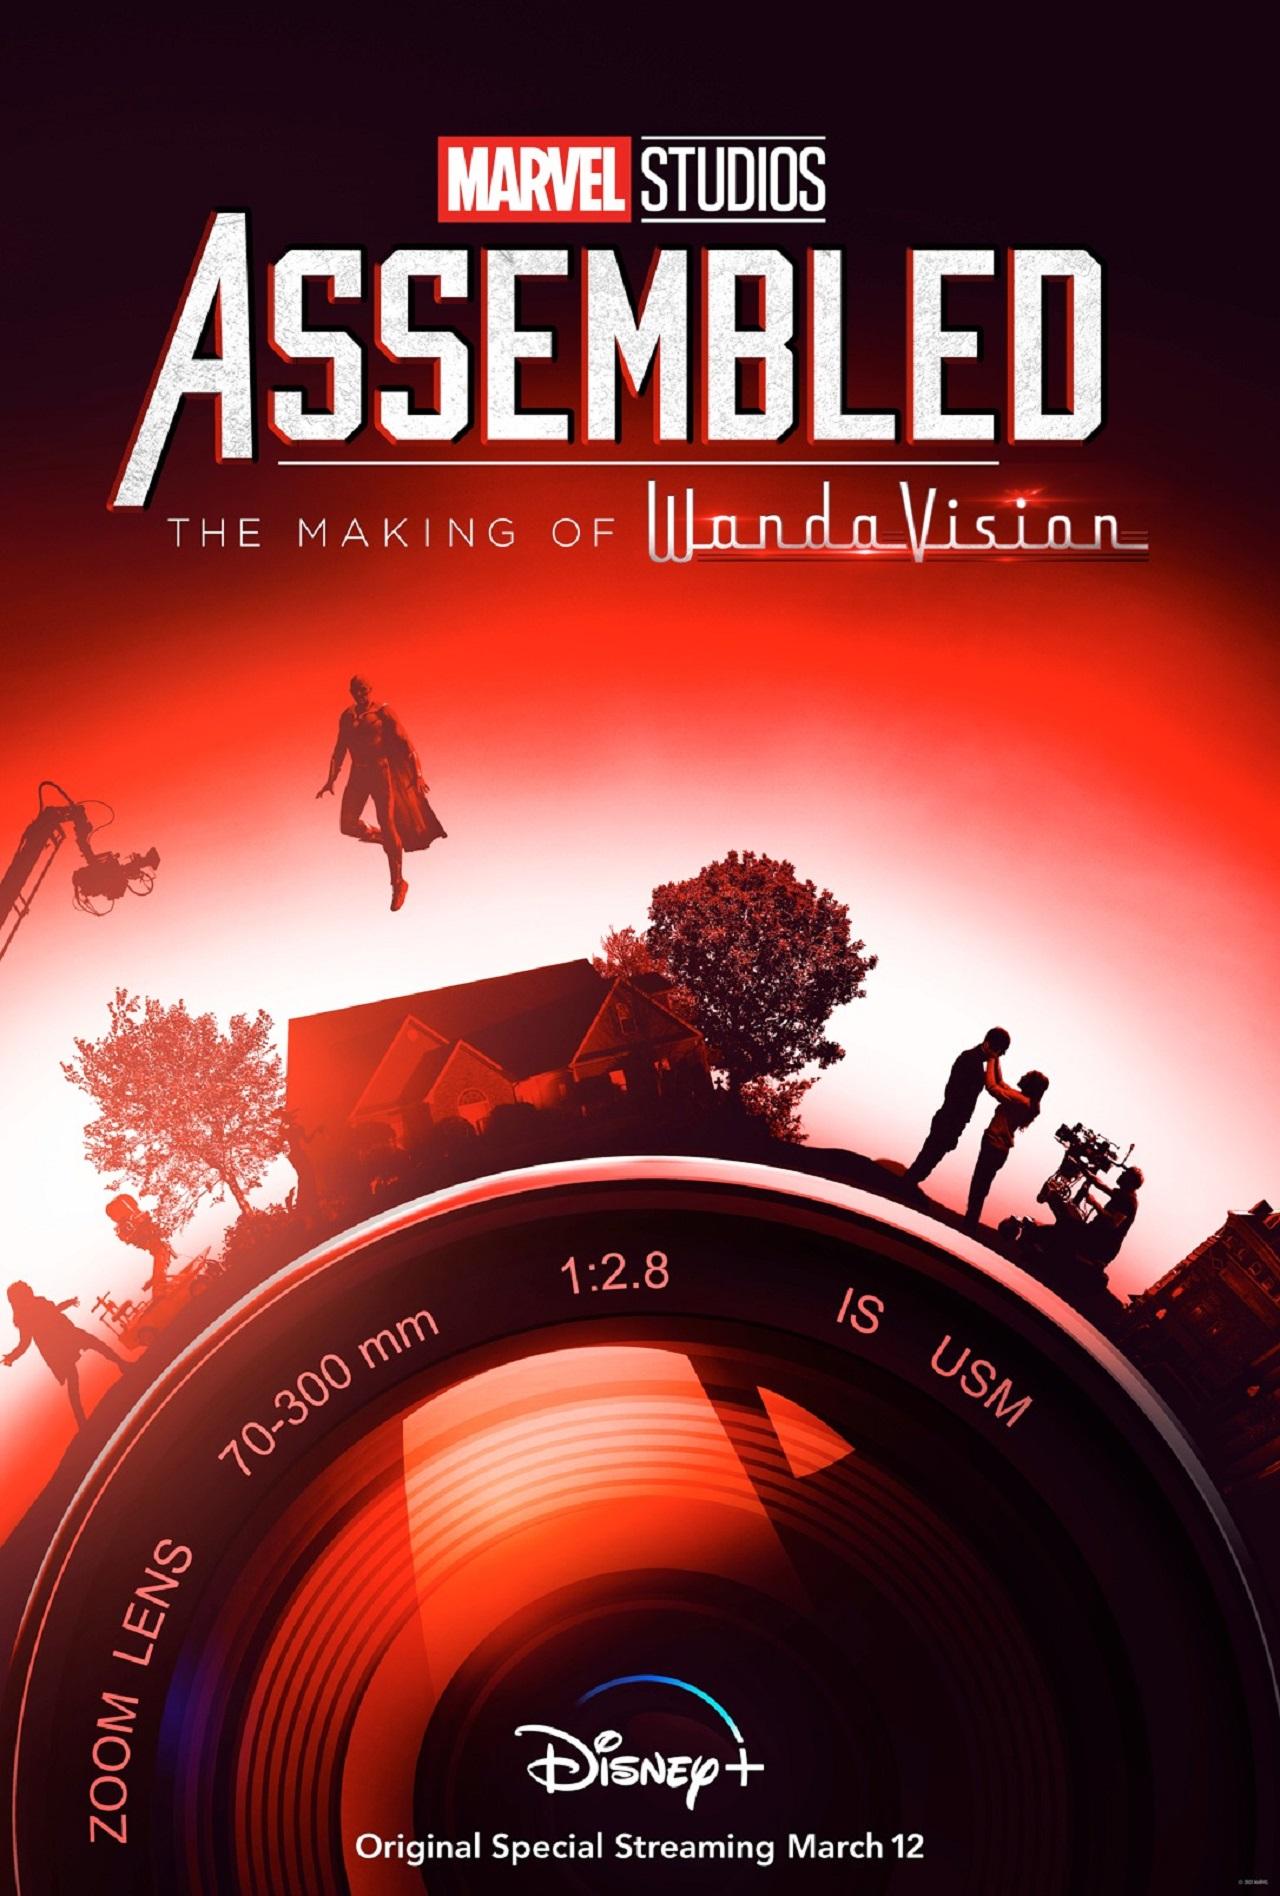 Marvel Assembled the making of de WandaVision prepara estreno en Disney+